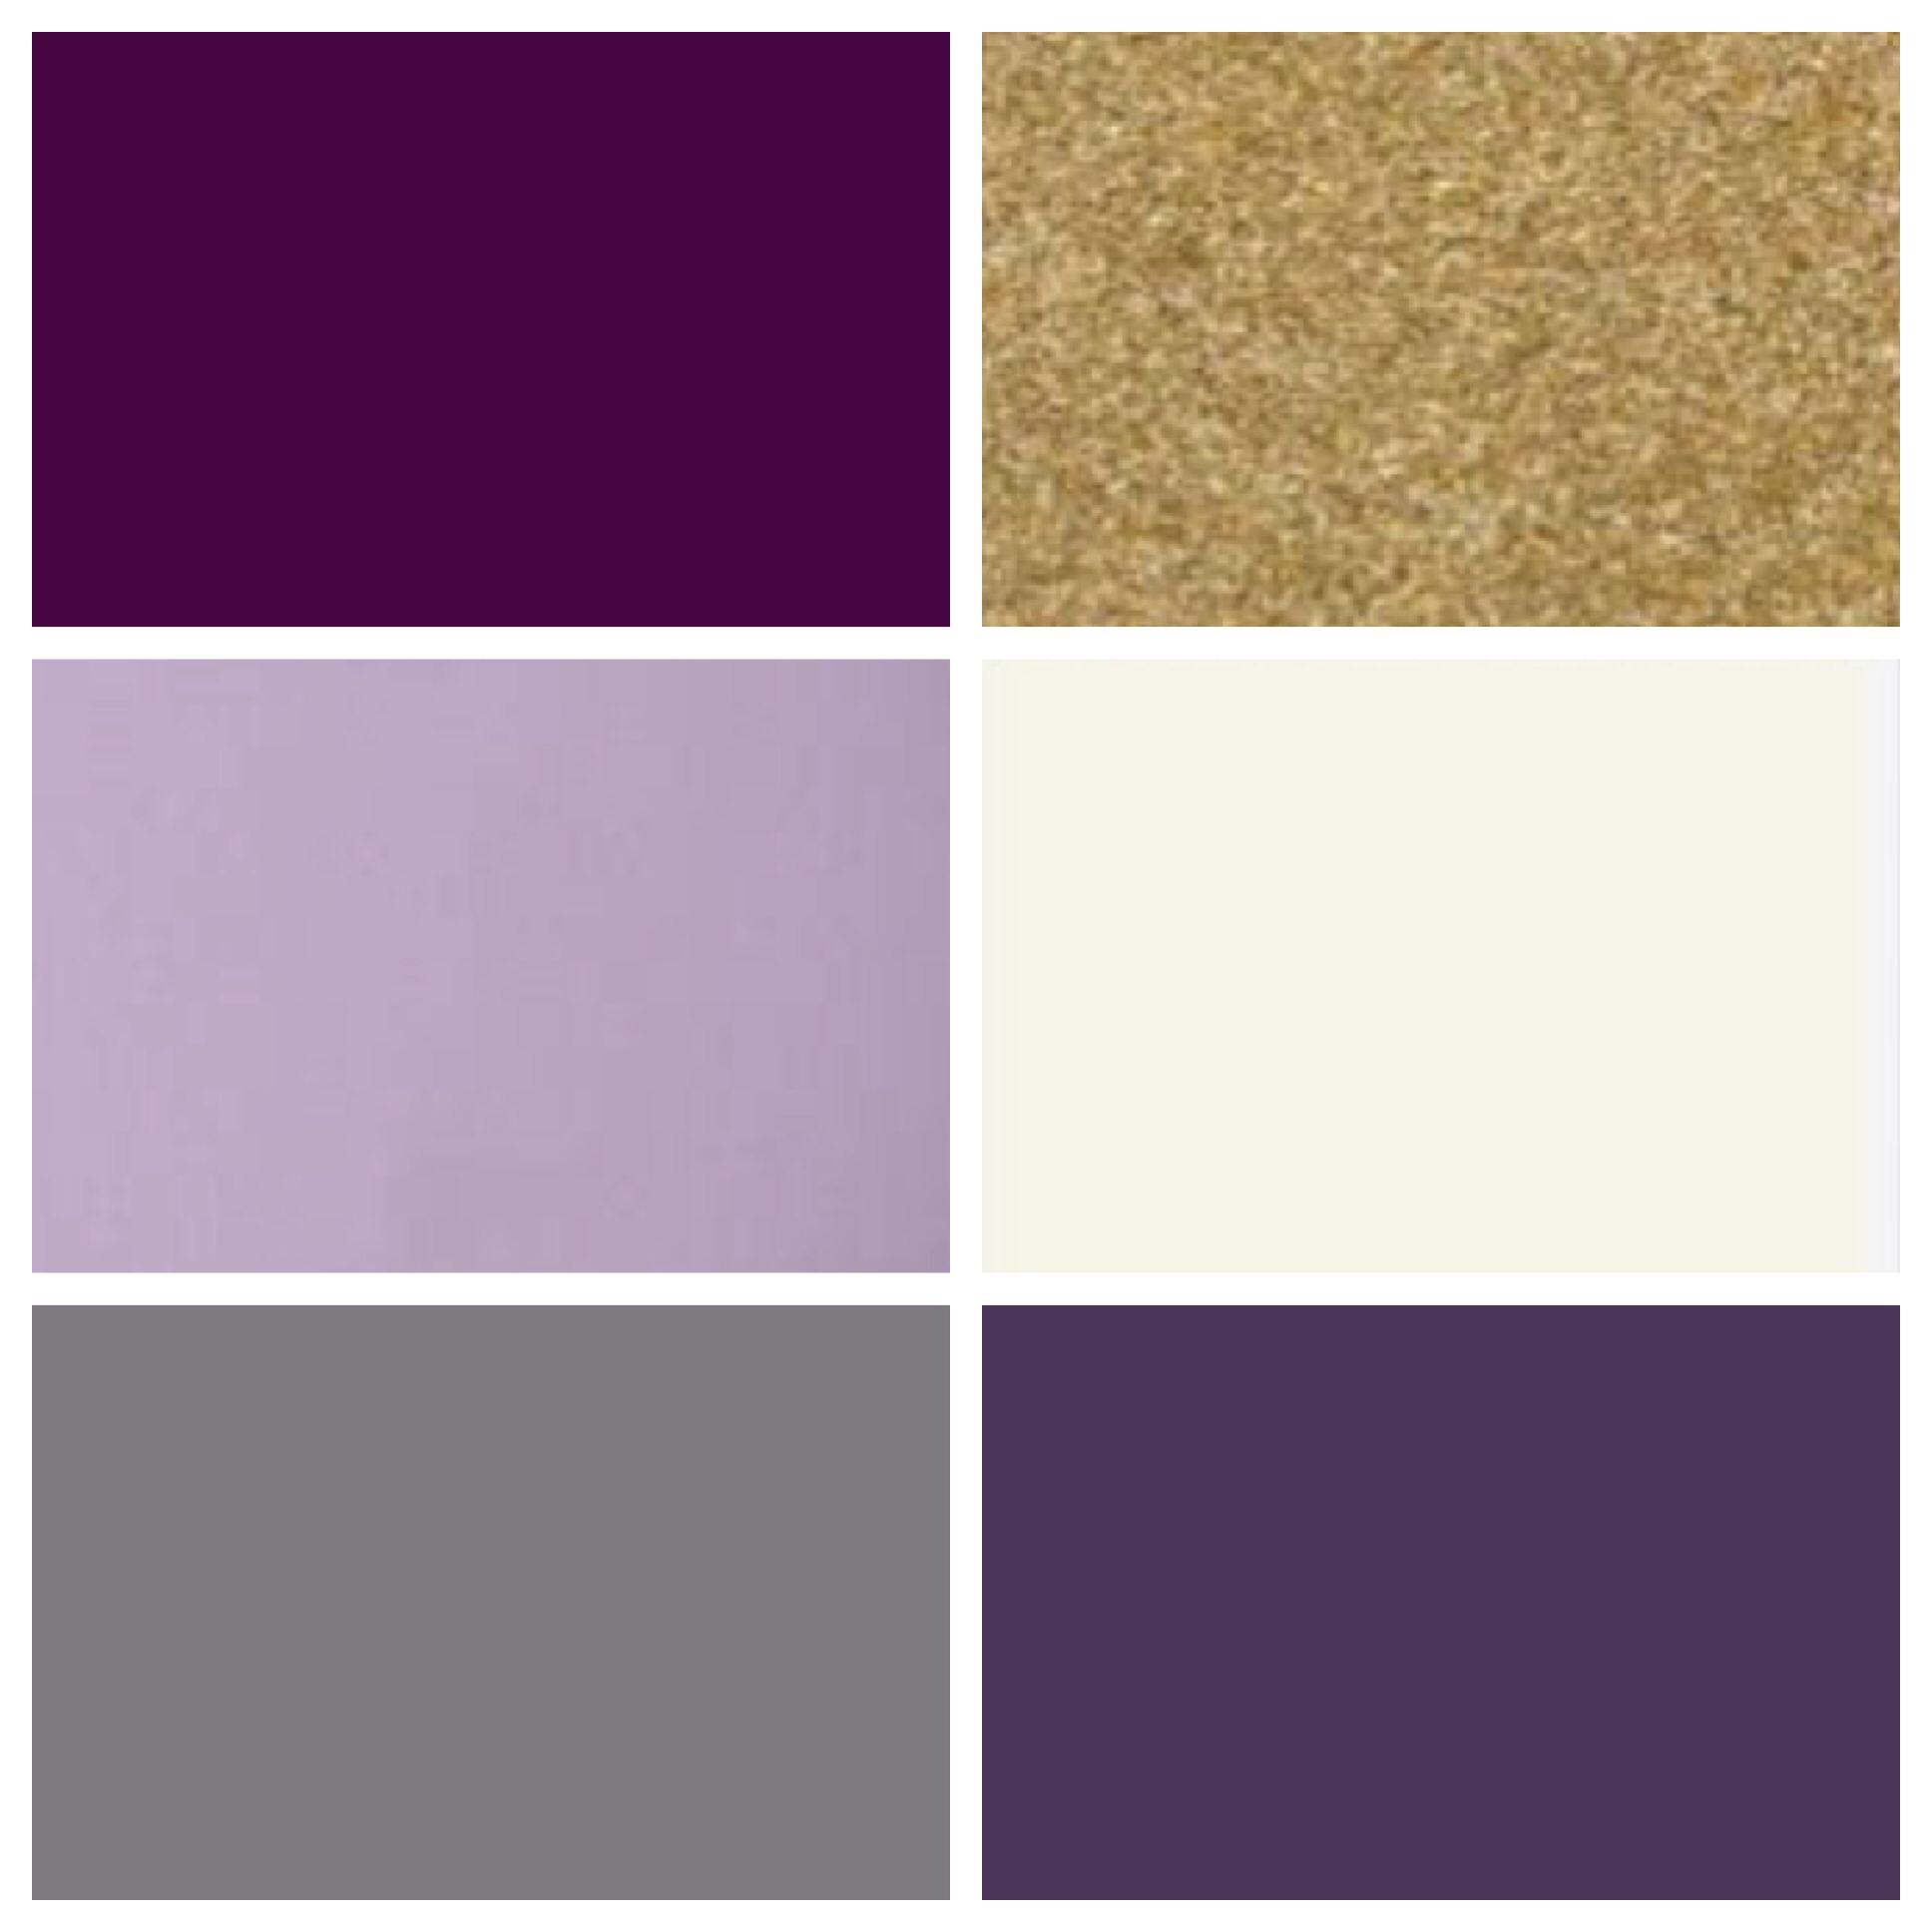 Cj Wedding Color Palette Plum Lilac Gray Gold Cream Eggplant in measurements 1936 X 1936